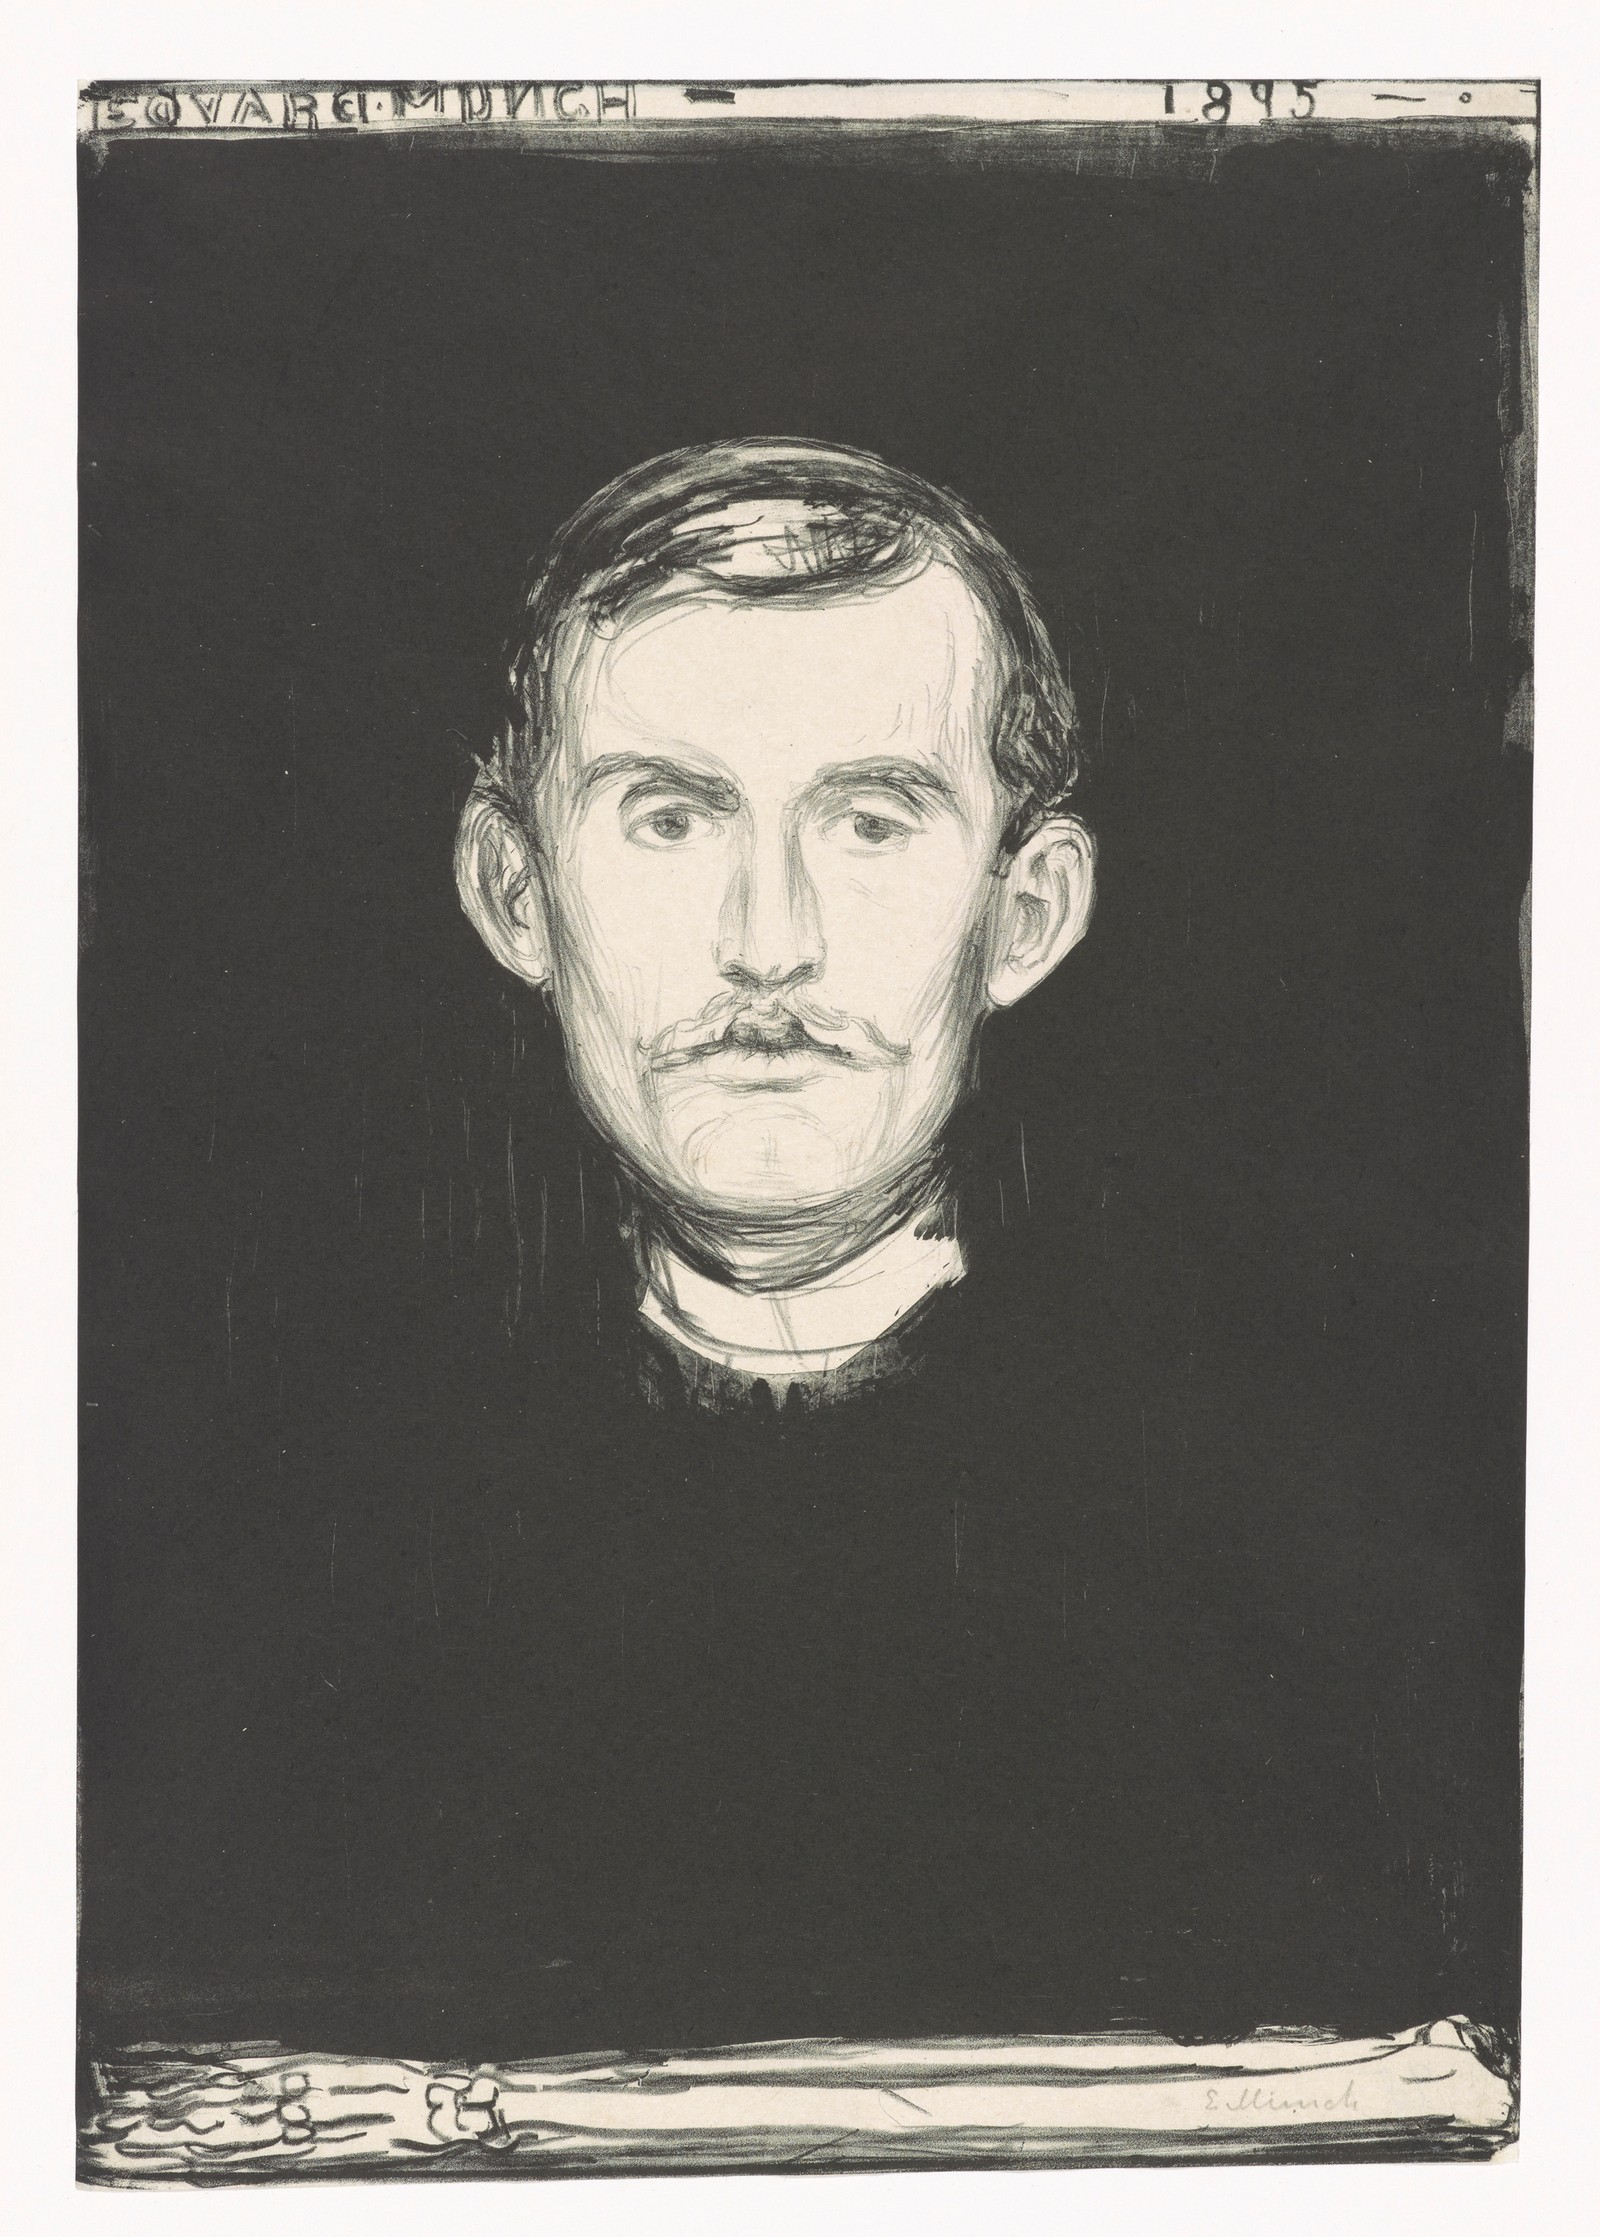 Munch: Selvportrett, 1895